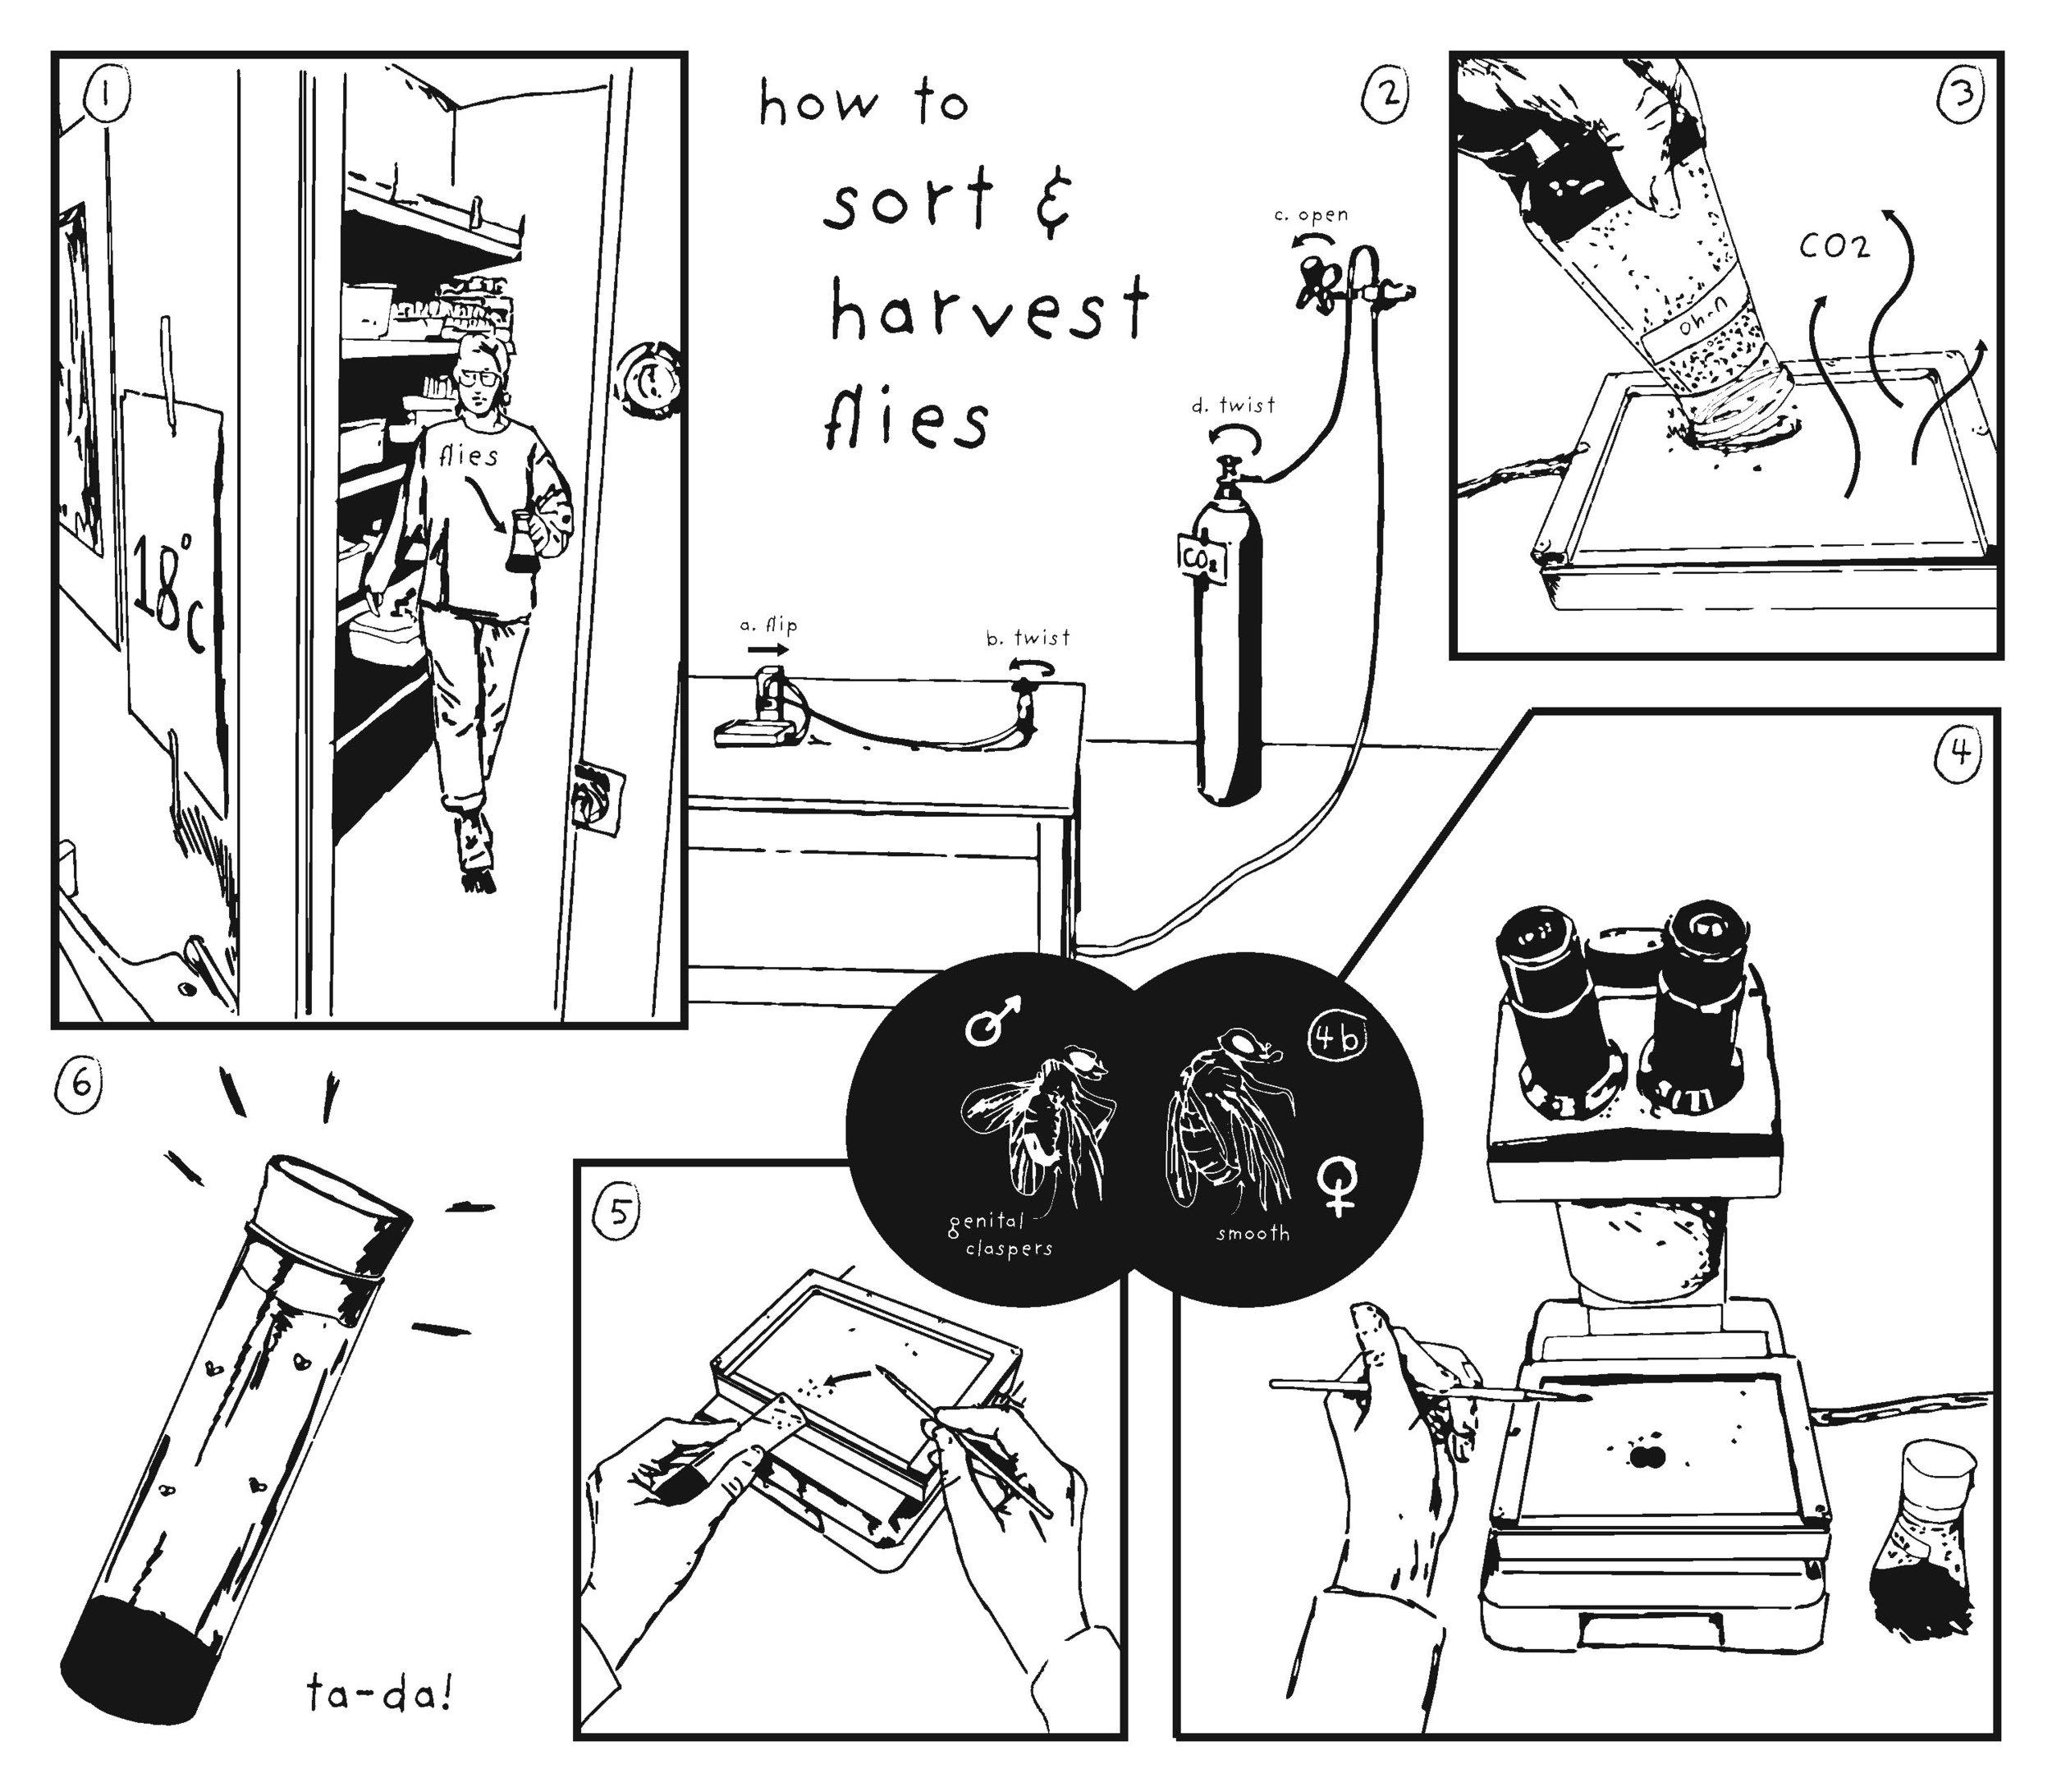 how to sort & harvest flies, 2019  digital media